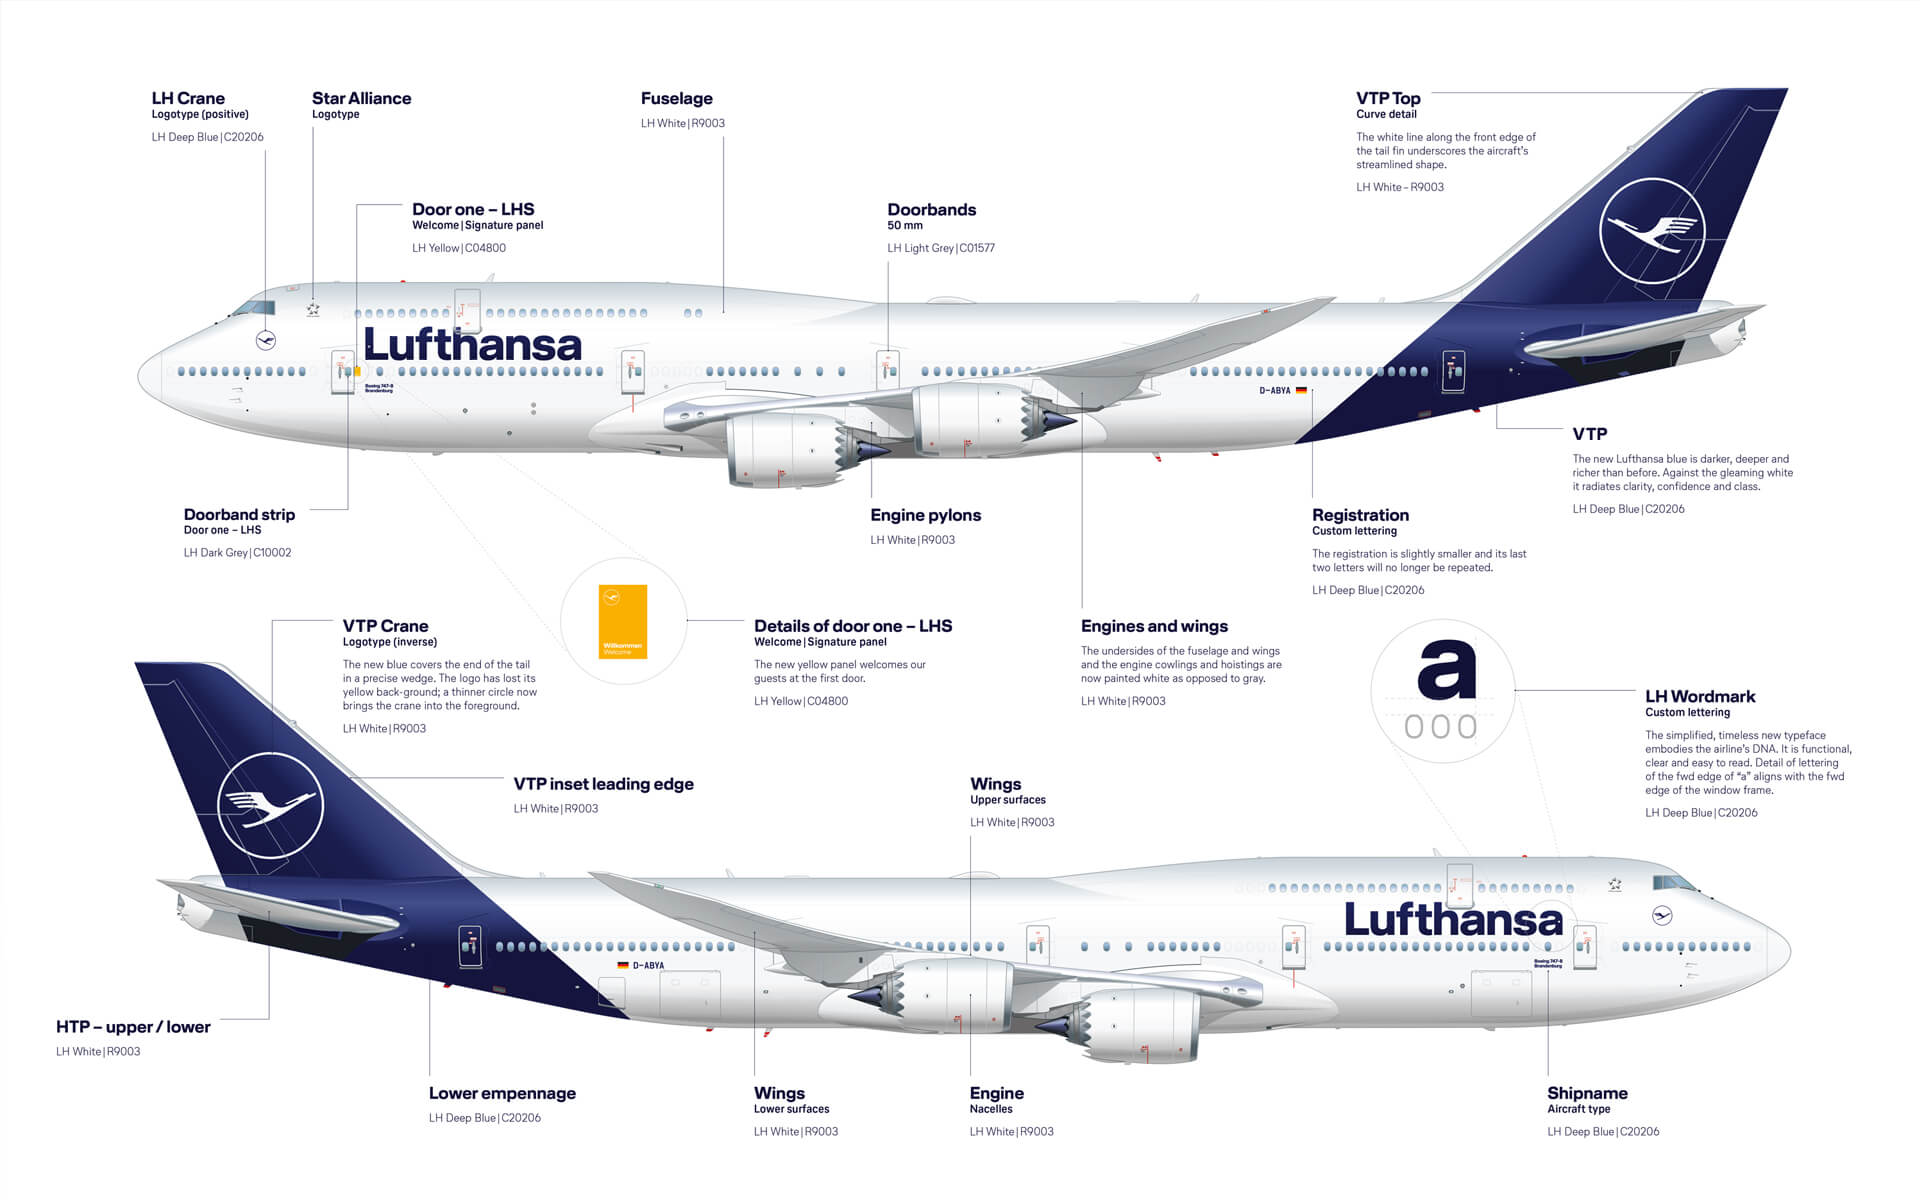 Lufthansa Corporate Design 2018, Redesign, Airplane Design